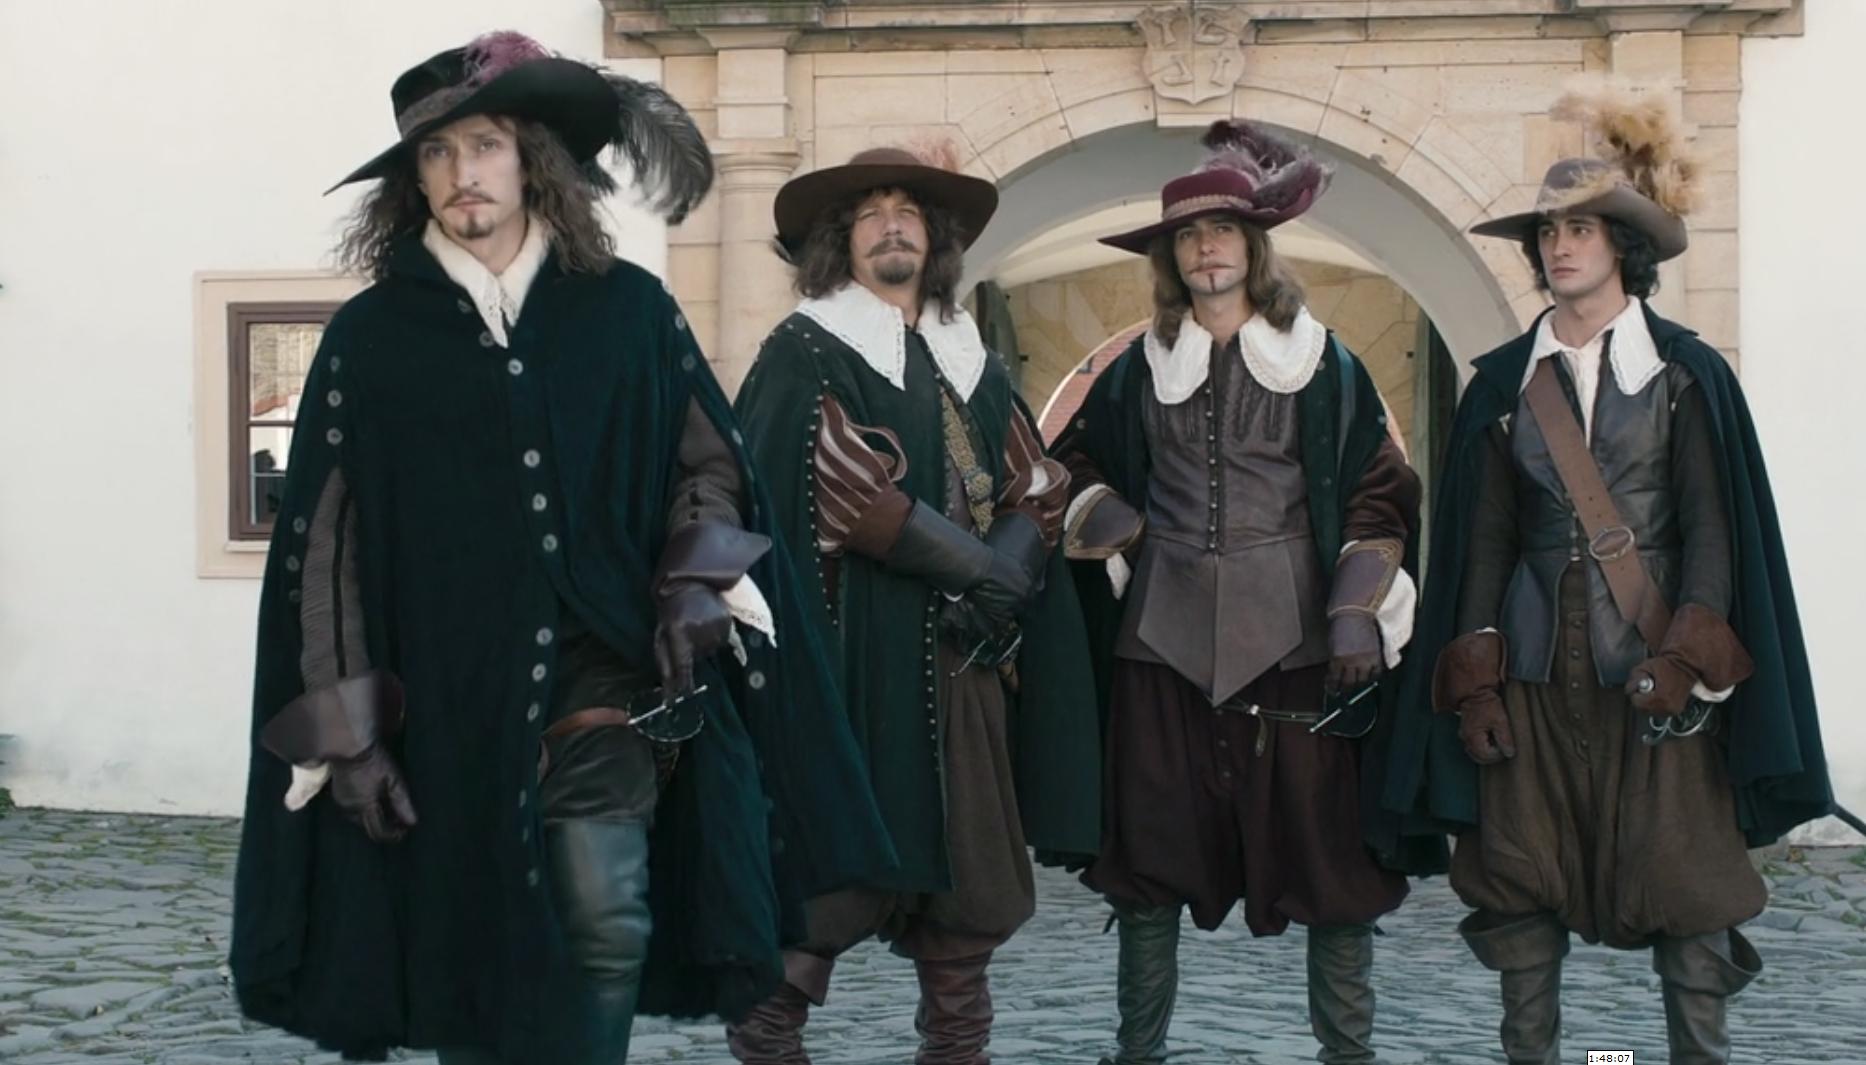 картинки четыре мушкетера подробно